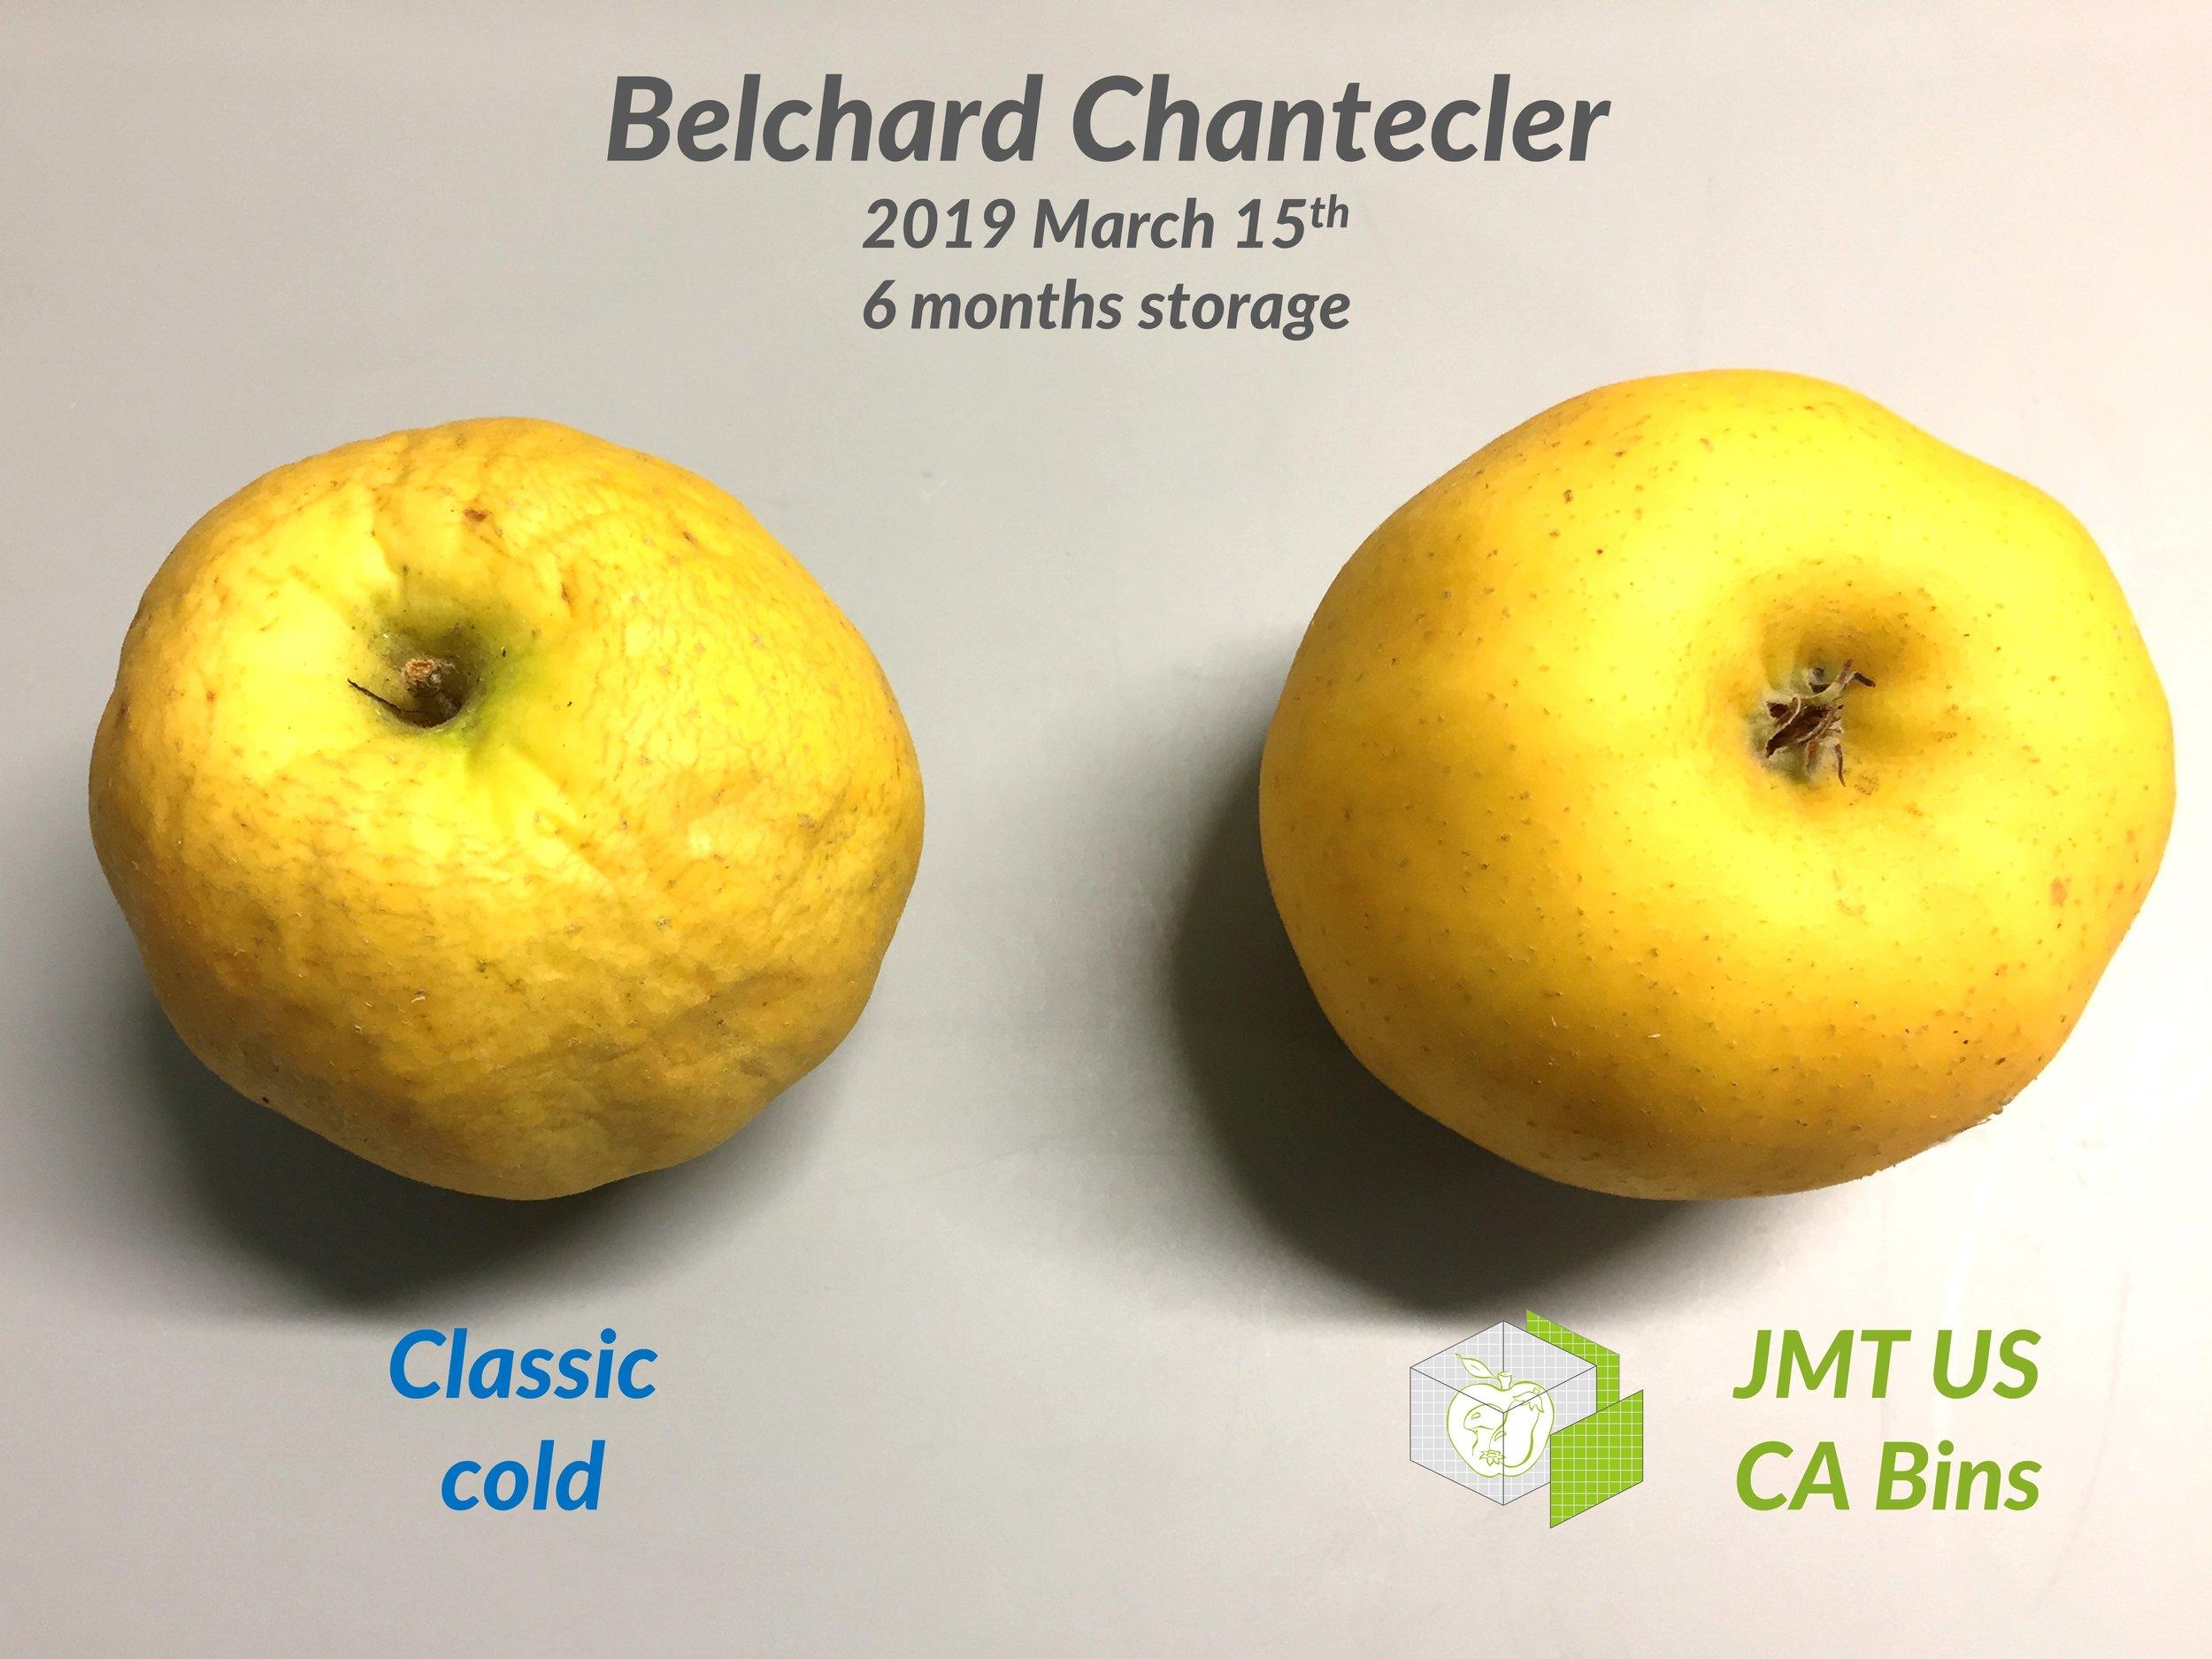 JMT US_Belchard apple_6 months.JPG